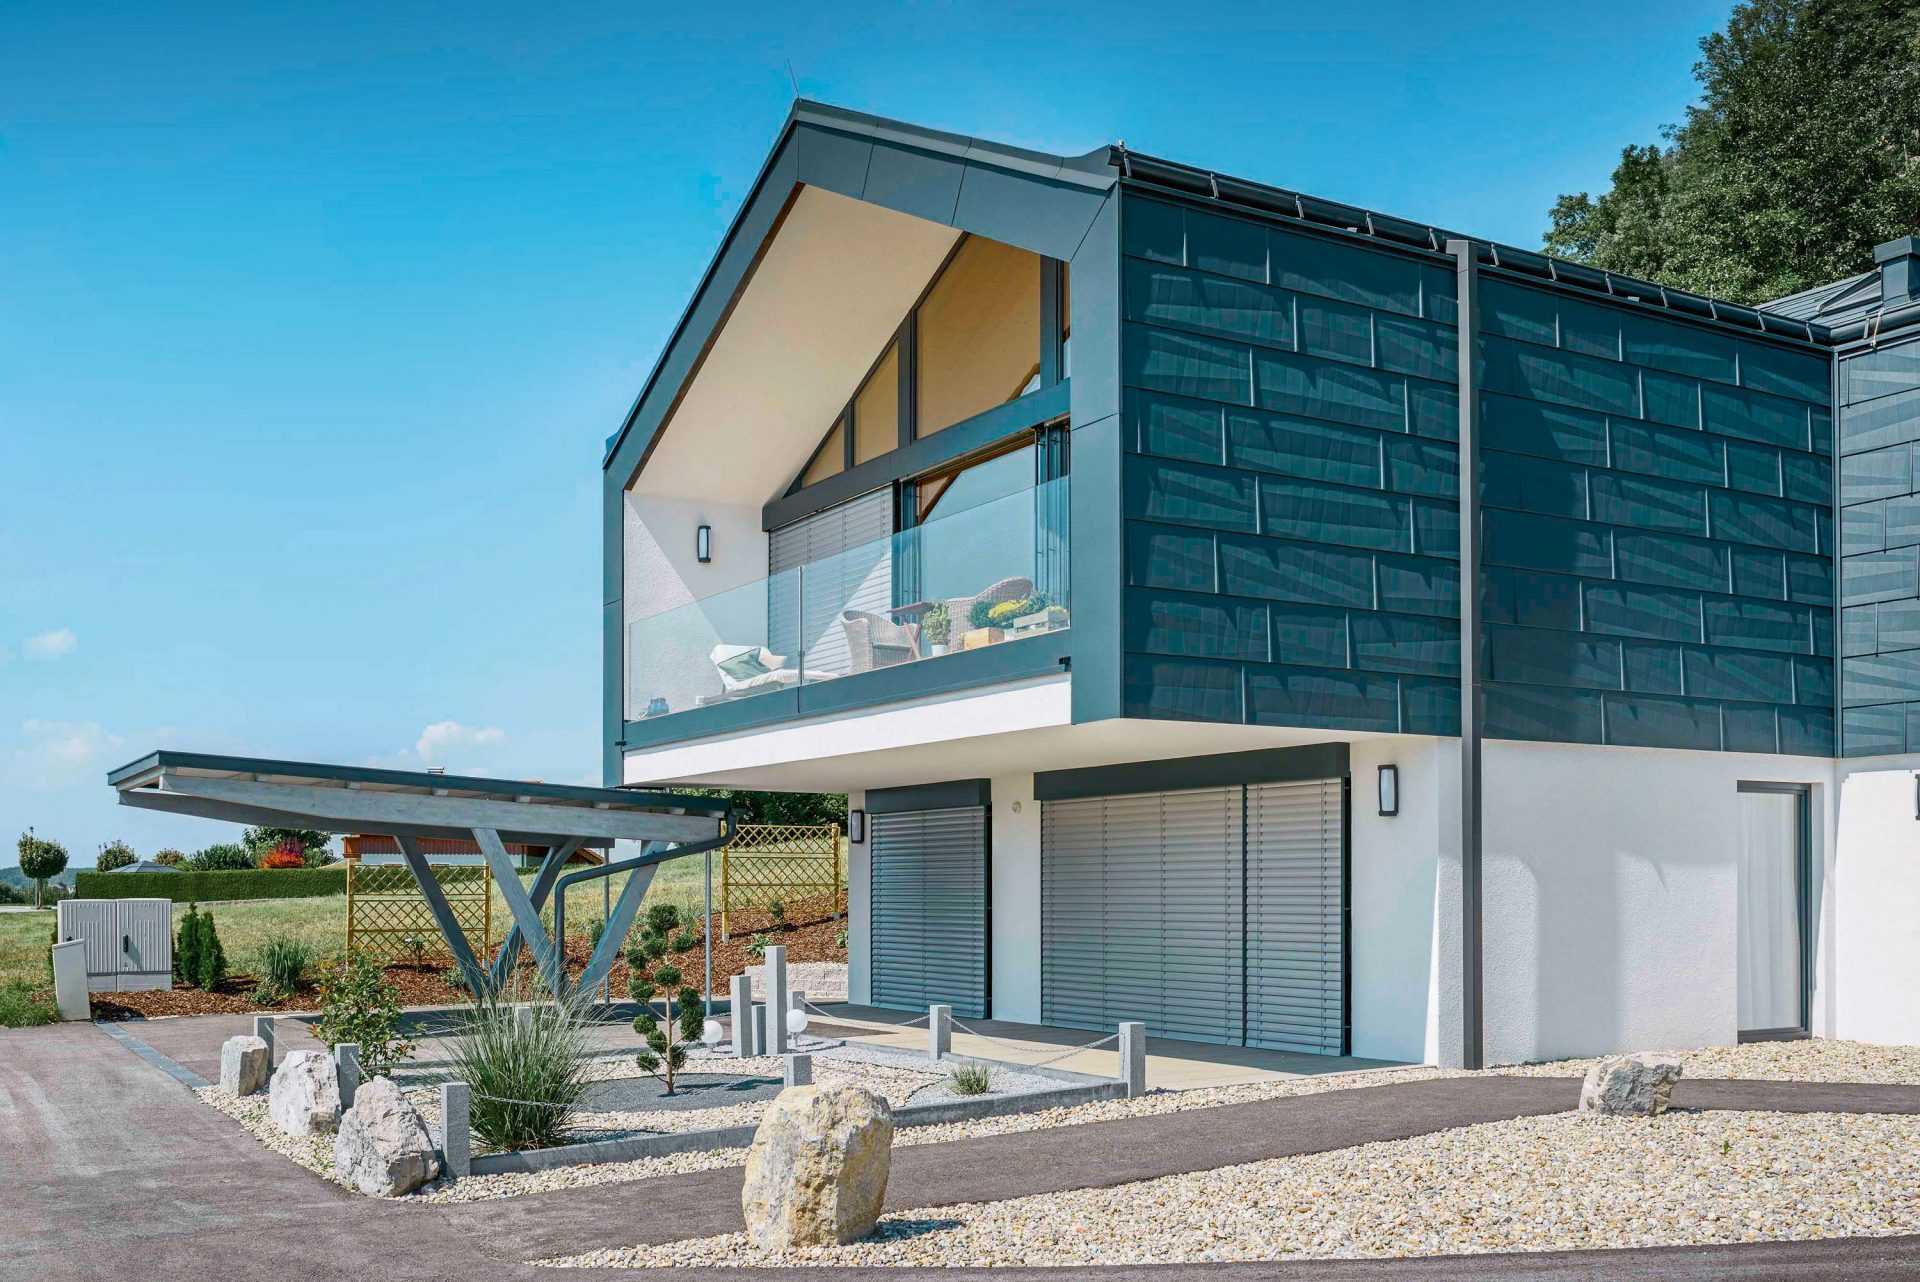 dom-stavba-novostavba-pozemok-kamene-skaly-velke-okna-strecha-terasa-dreve-brana